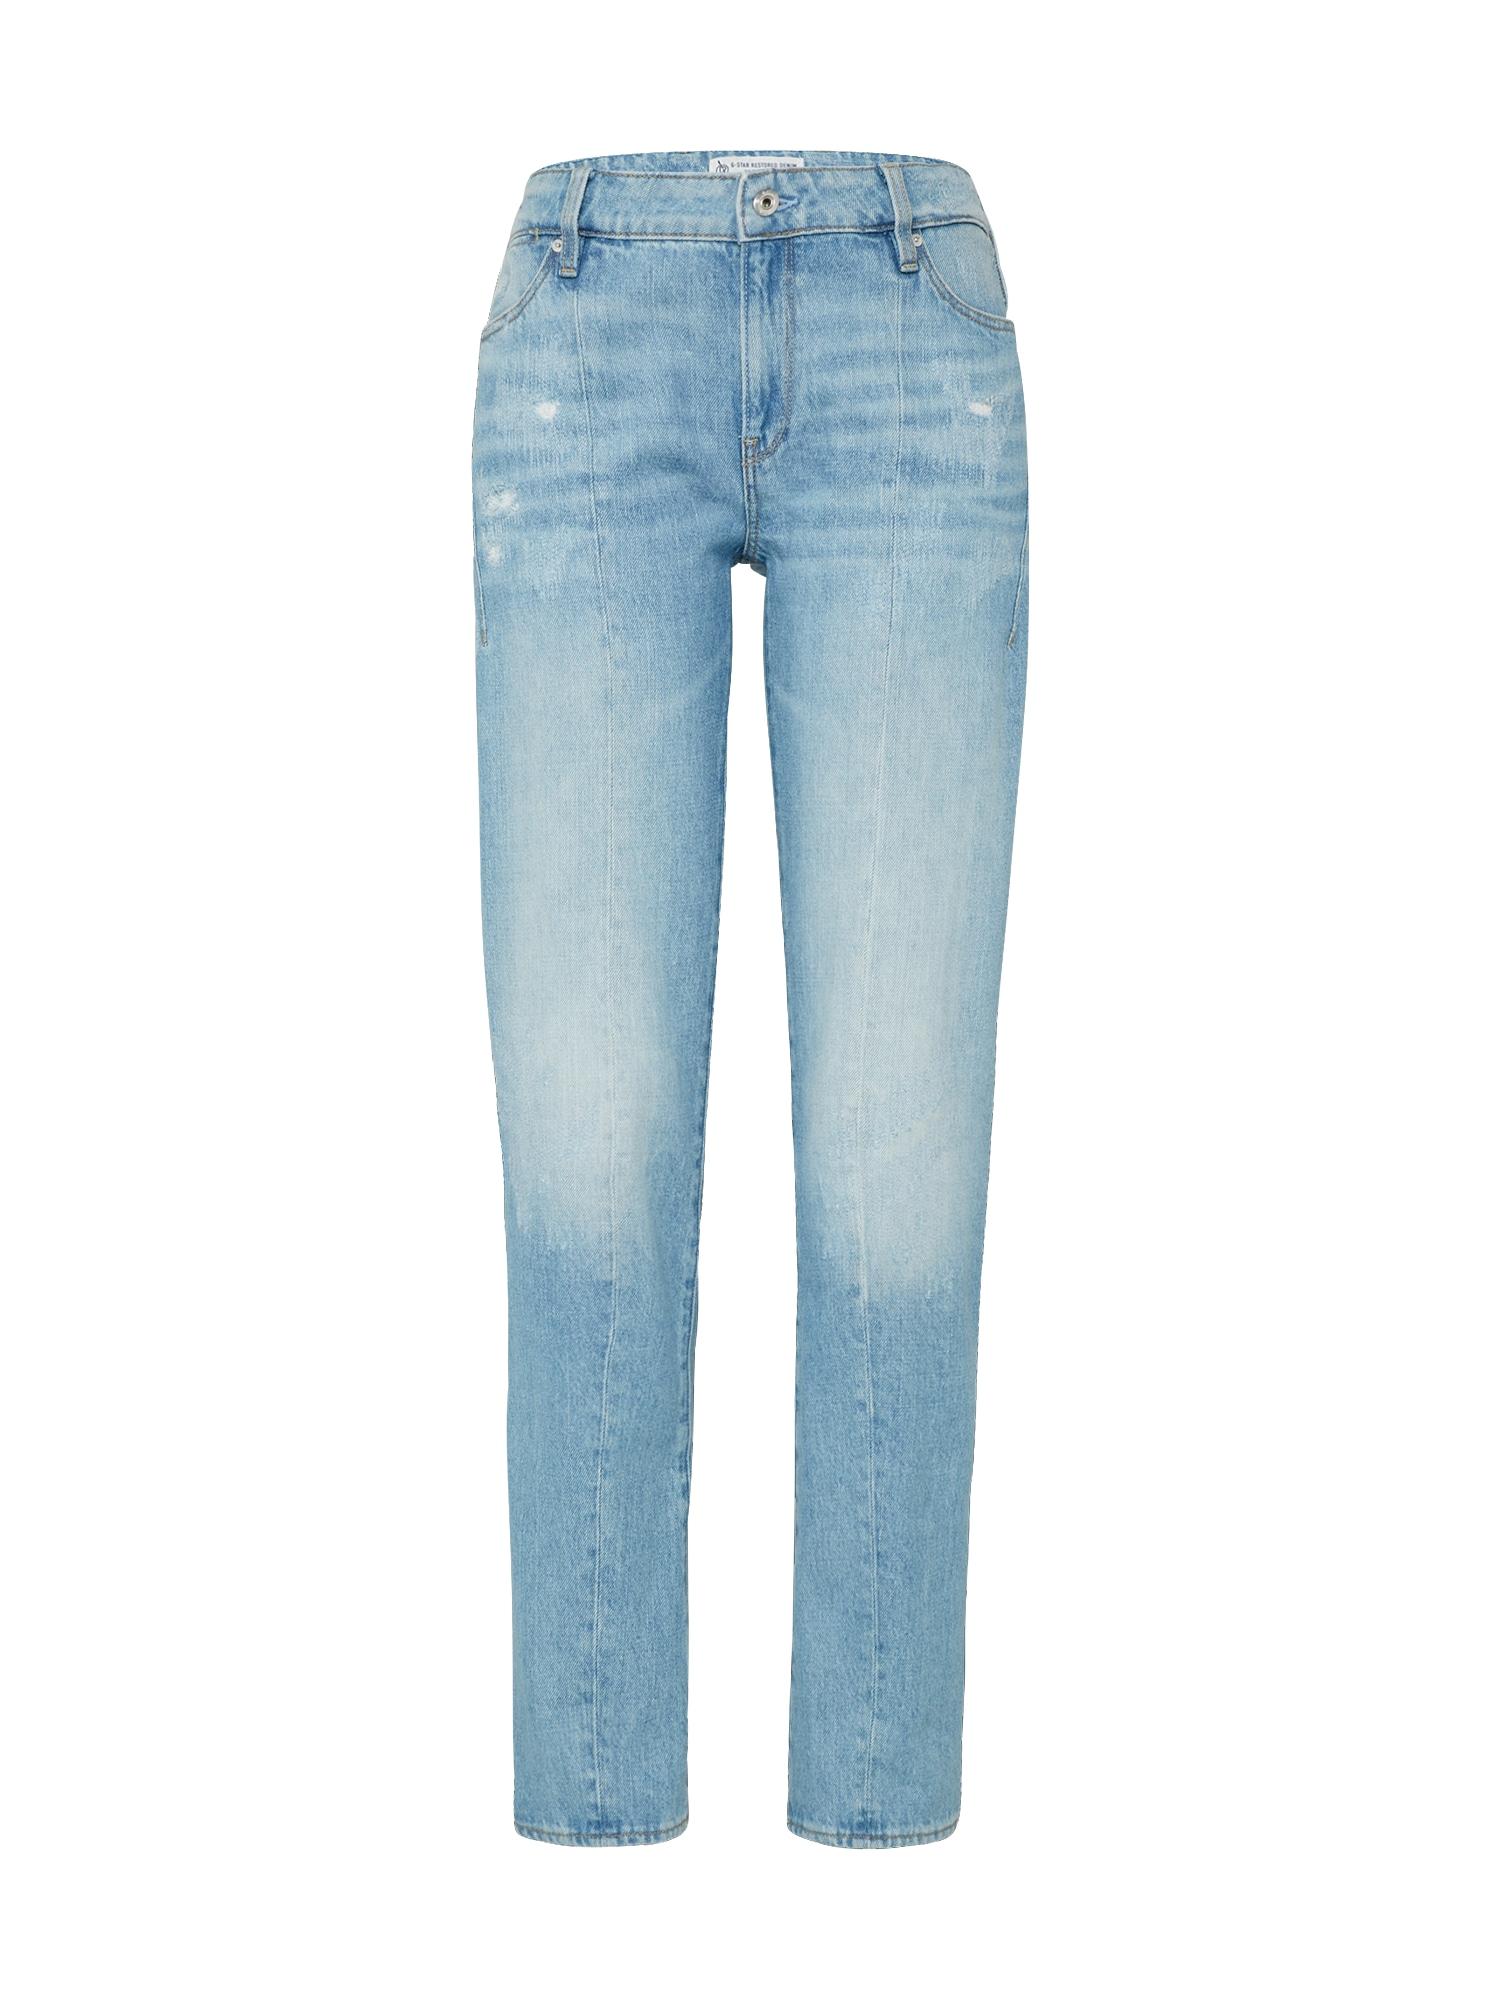 G-STAR RAW Dames Jeans Lanc 3D High Straight blue denim